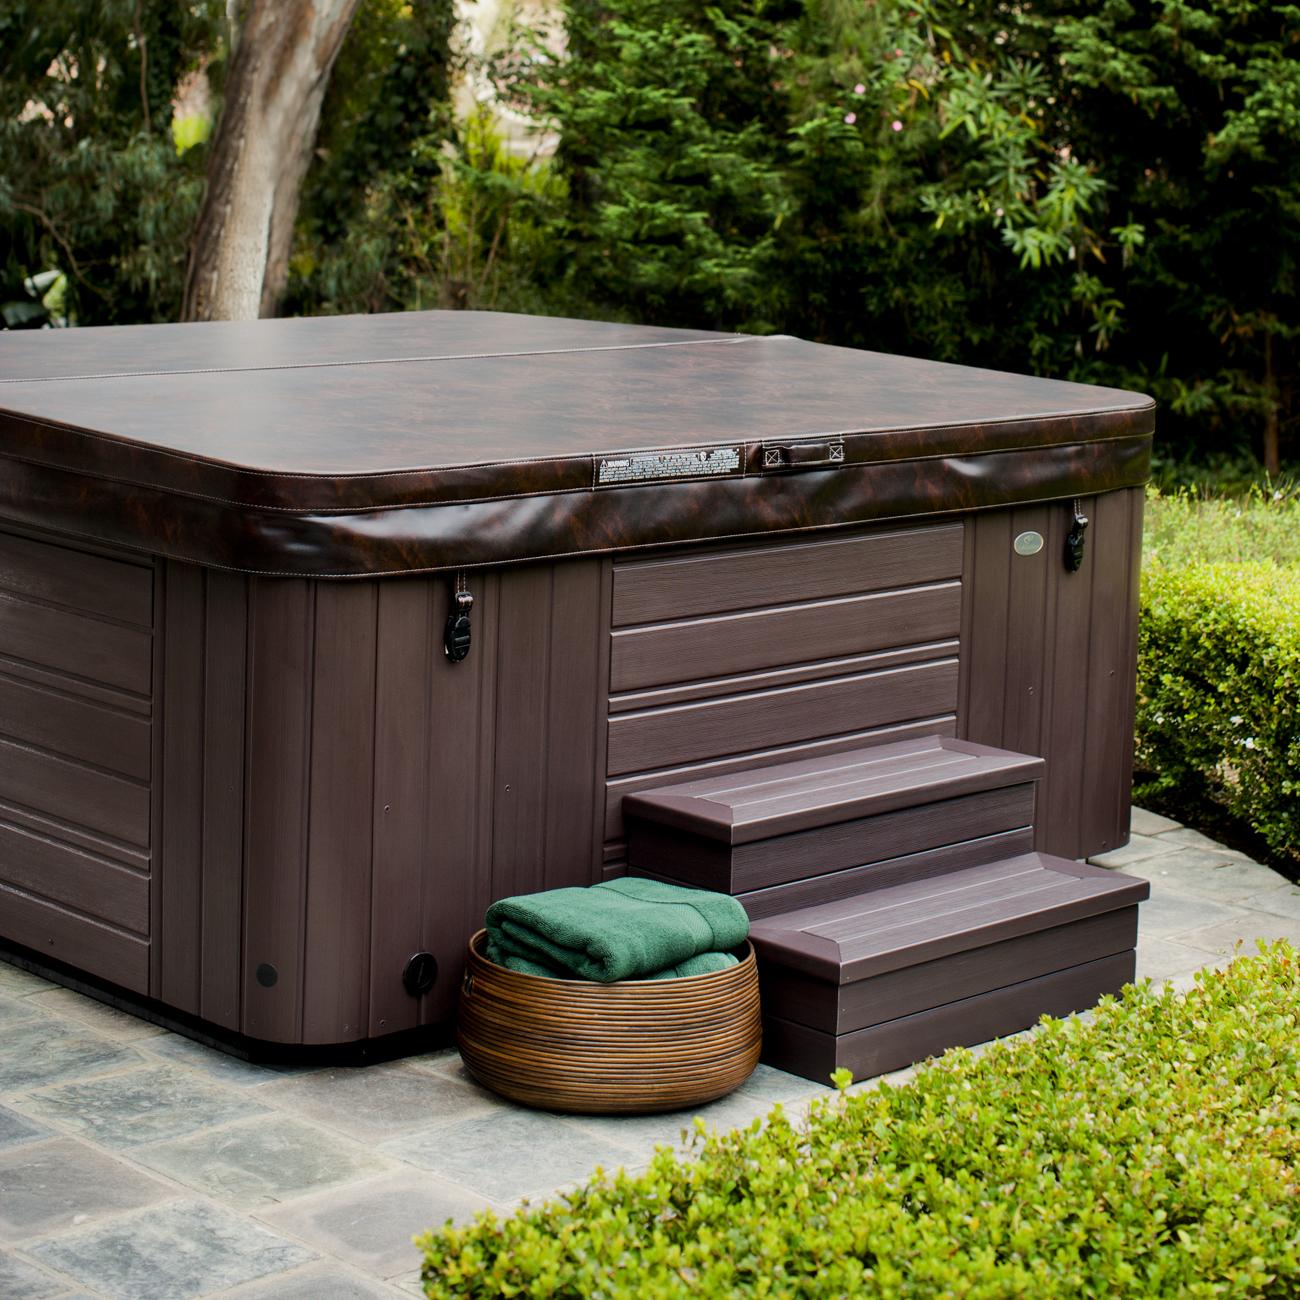 Caldera Spa Makena 6 Person Luxury Outdoor Living